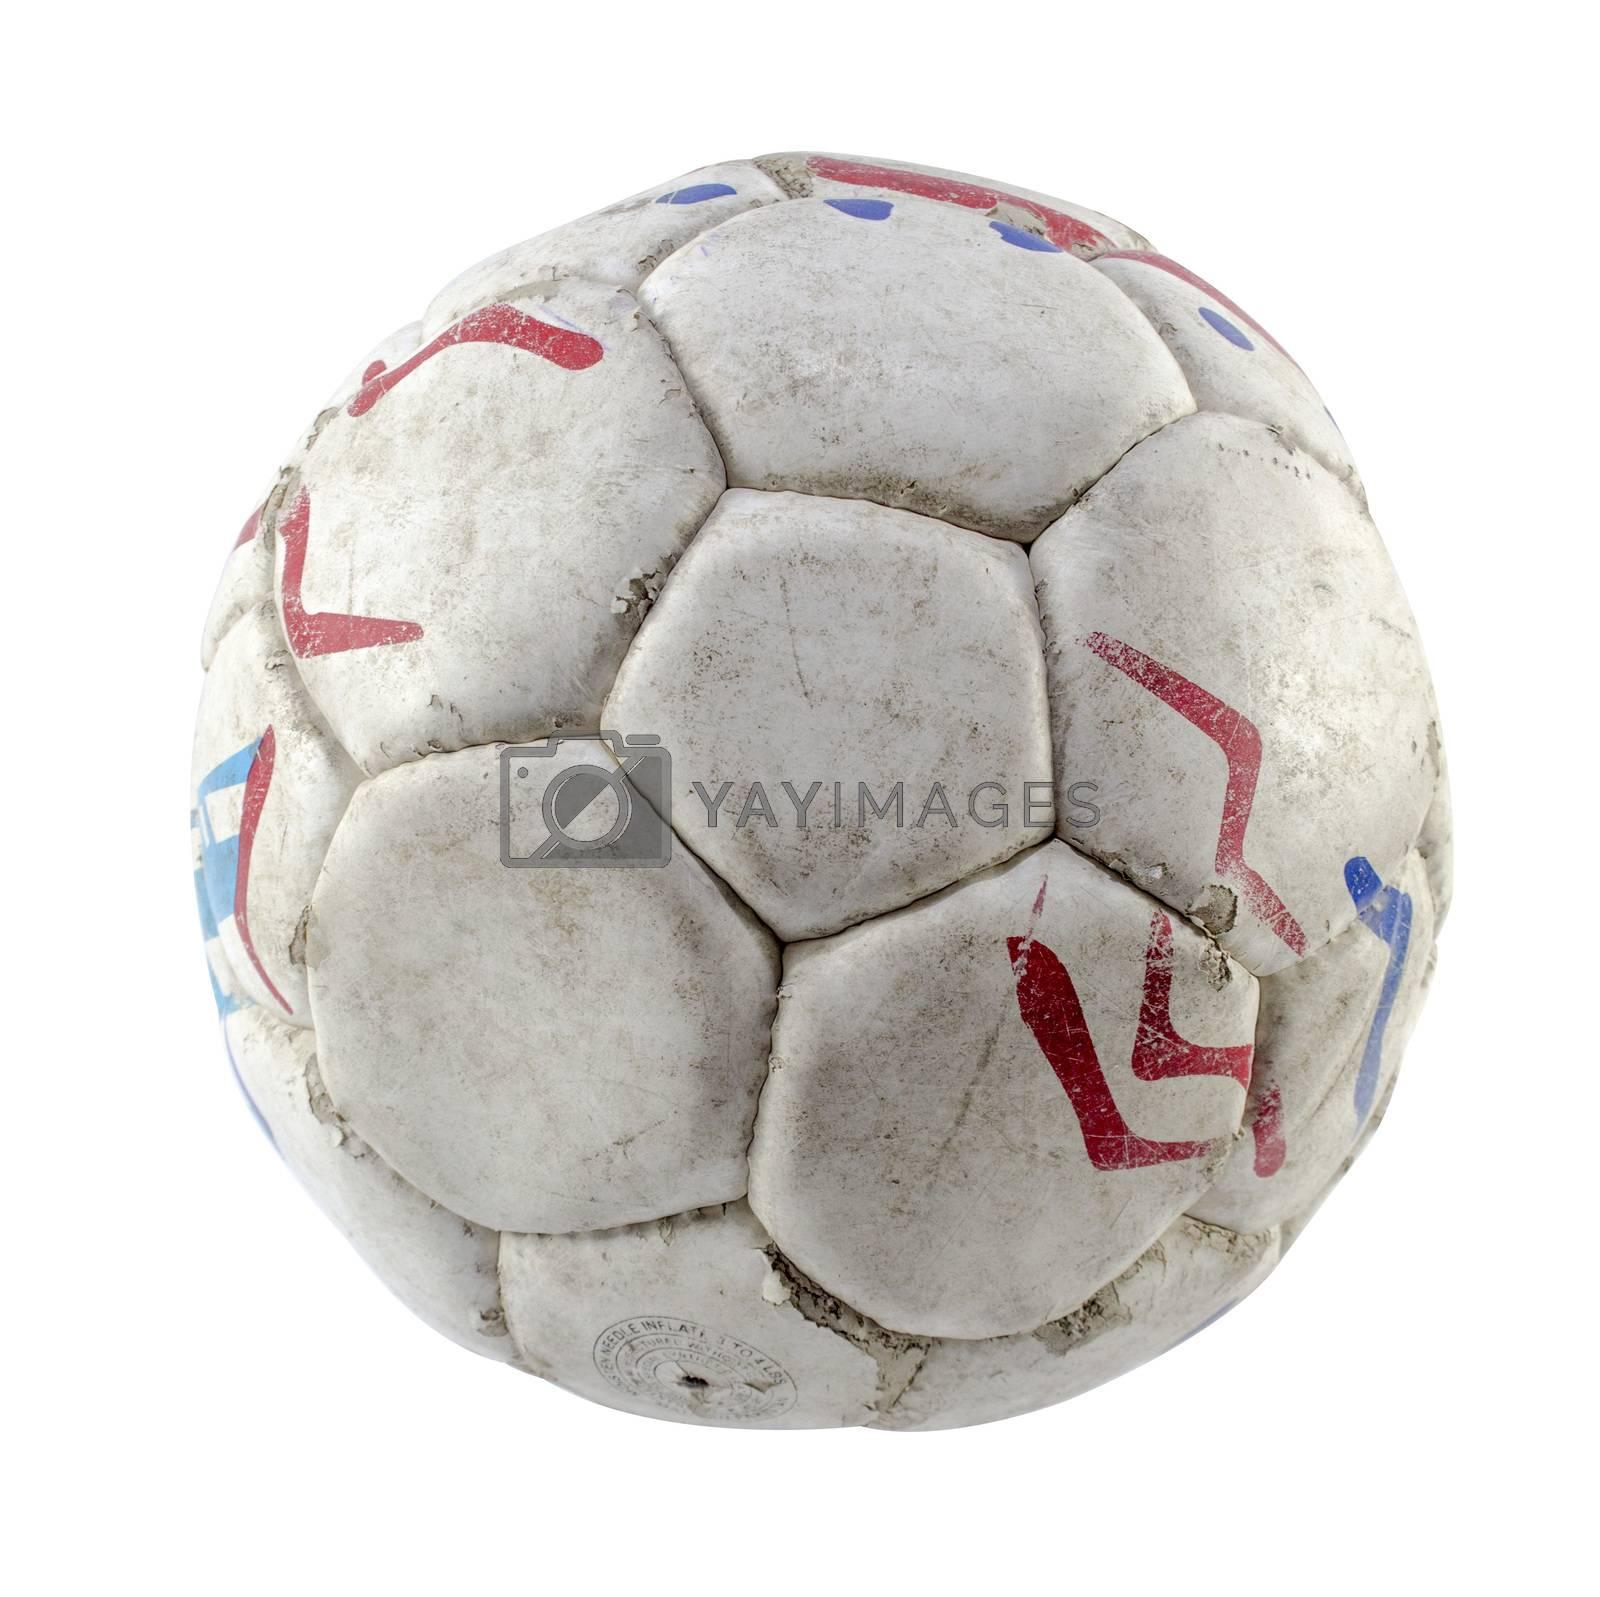 Grunge football or soccer ball on white background.